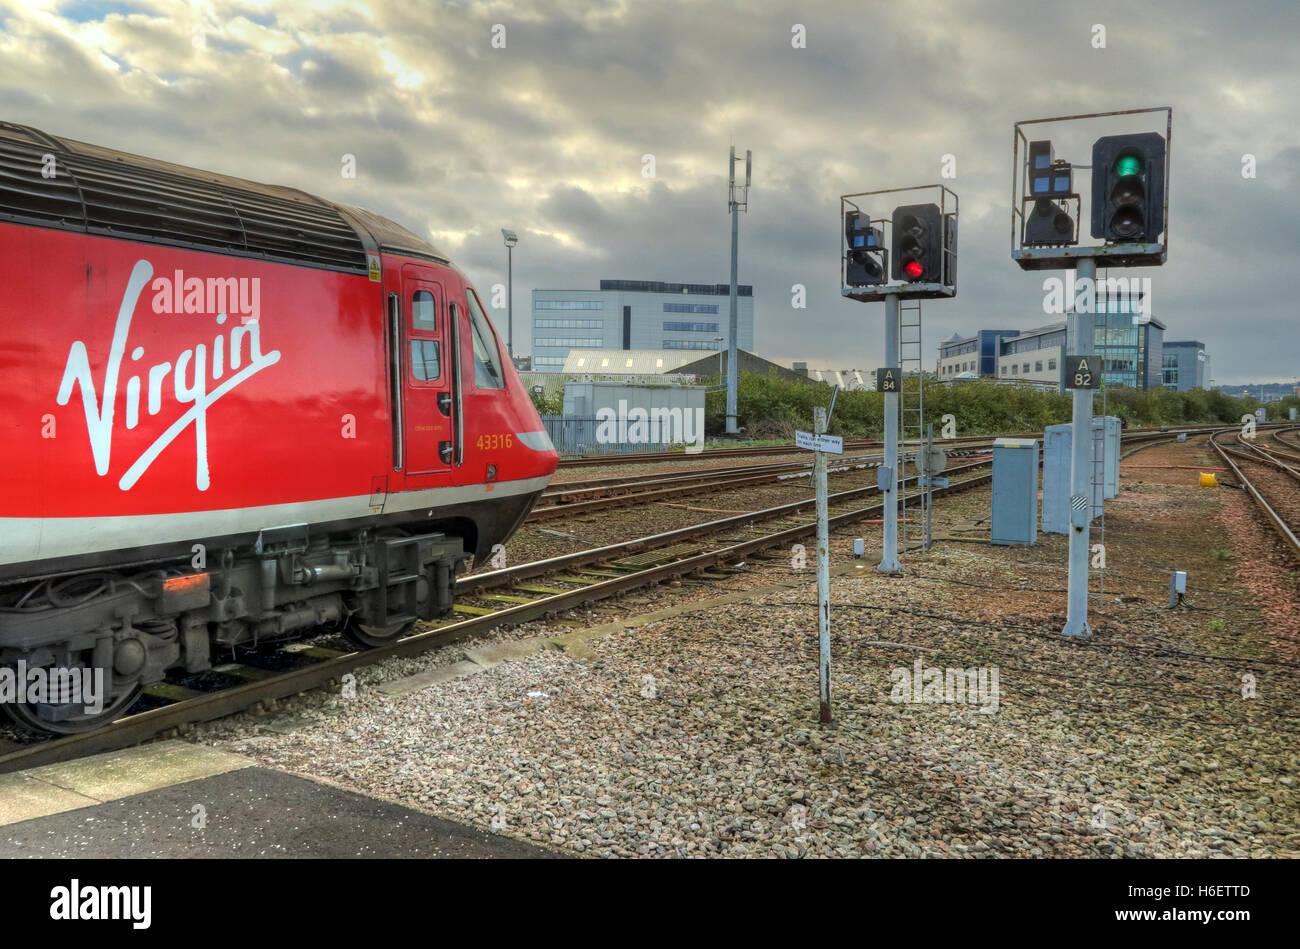 Virgin East Coast Mainline Train,Aberdeen Railway Station,Scotland,UK - Stock Image